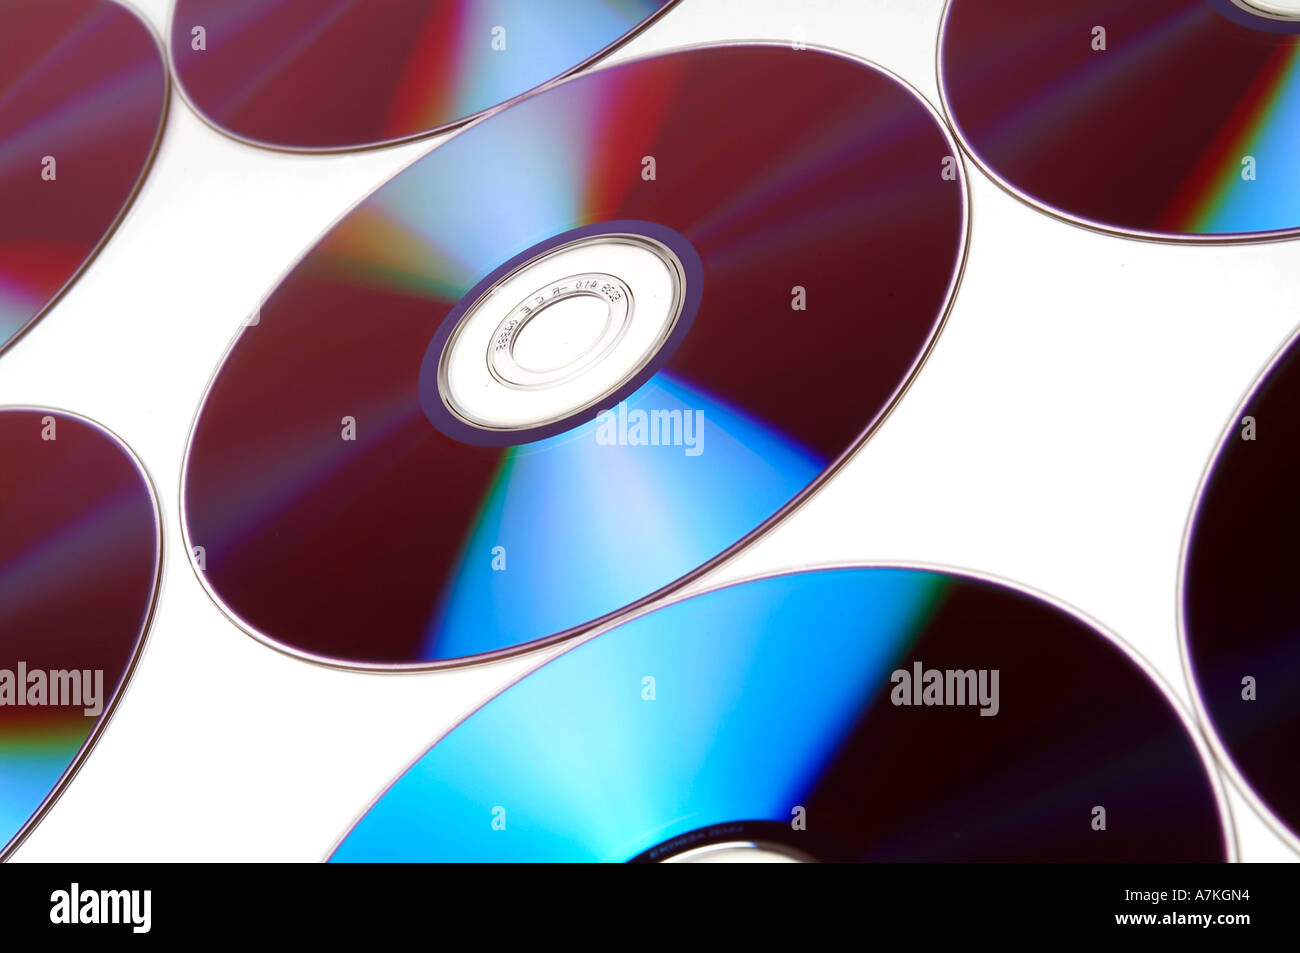 cd, dvd, pirate, piracy, compact, disk, digital, data, versatile, storage, retrieval, spool, computer, blank, binary, cd, dvd, c - Stock Image